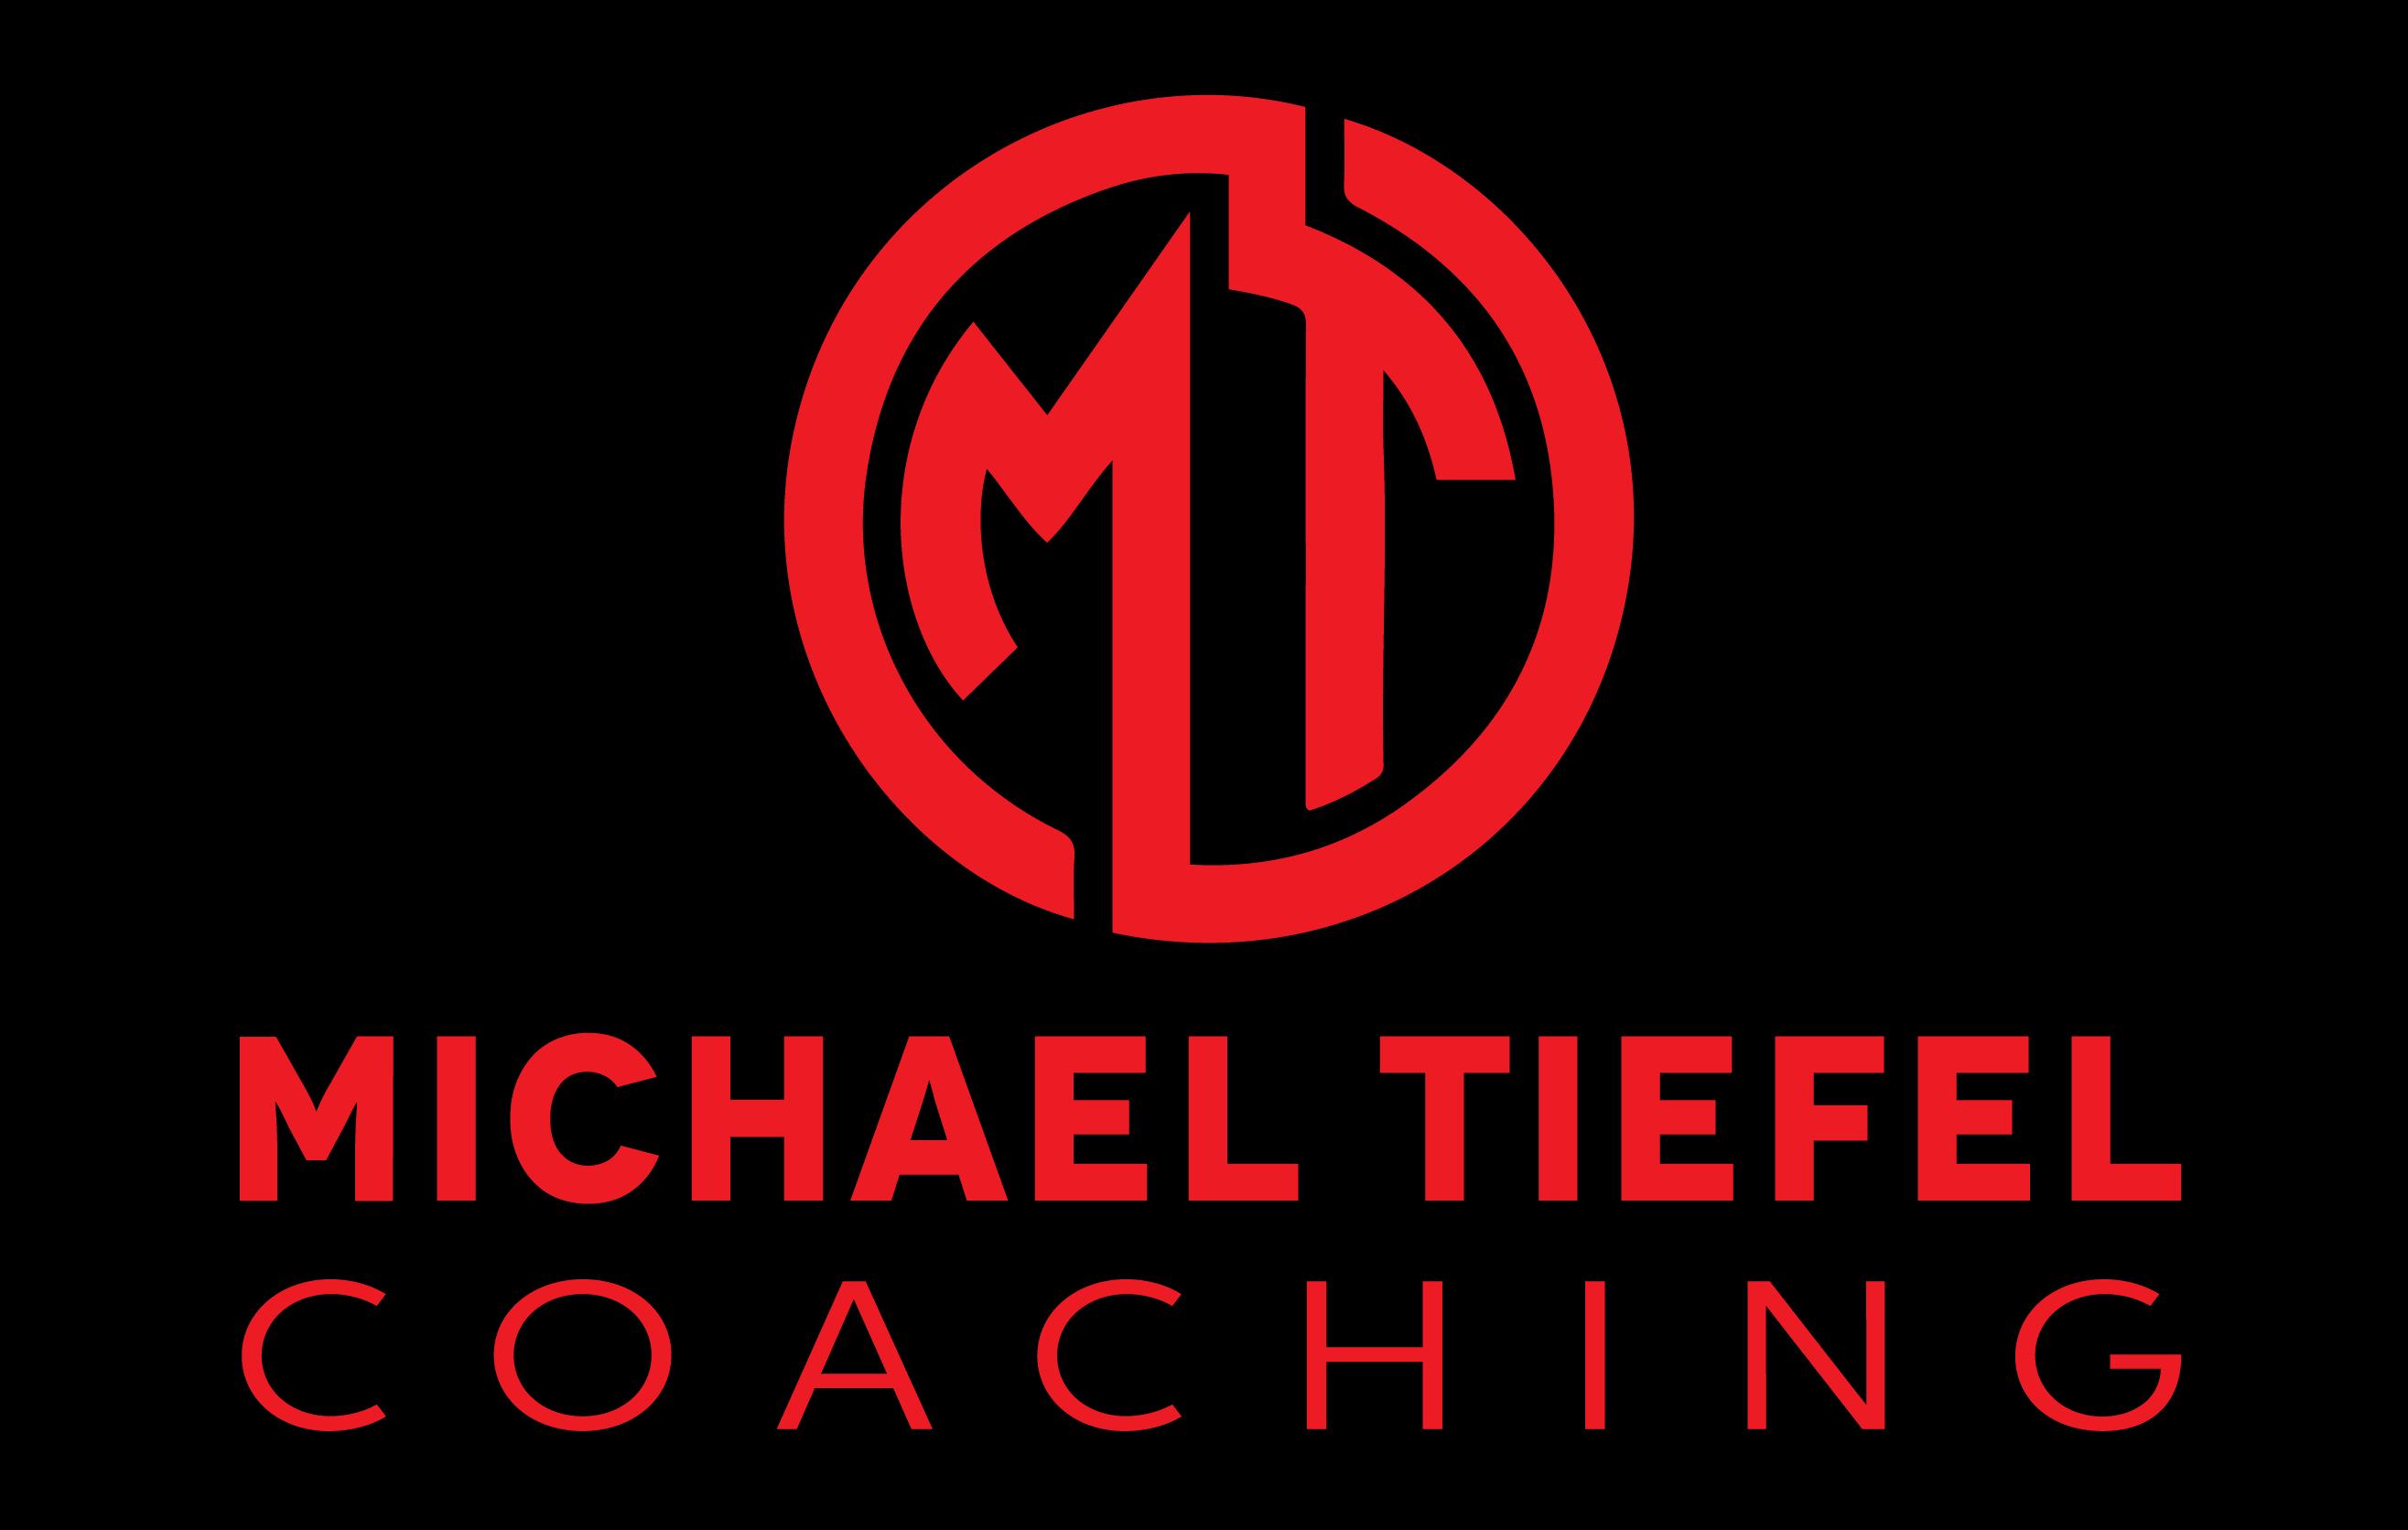 Wort-Bild-Marke_;ichael-Tiefel-Coaching